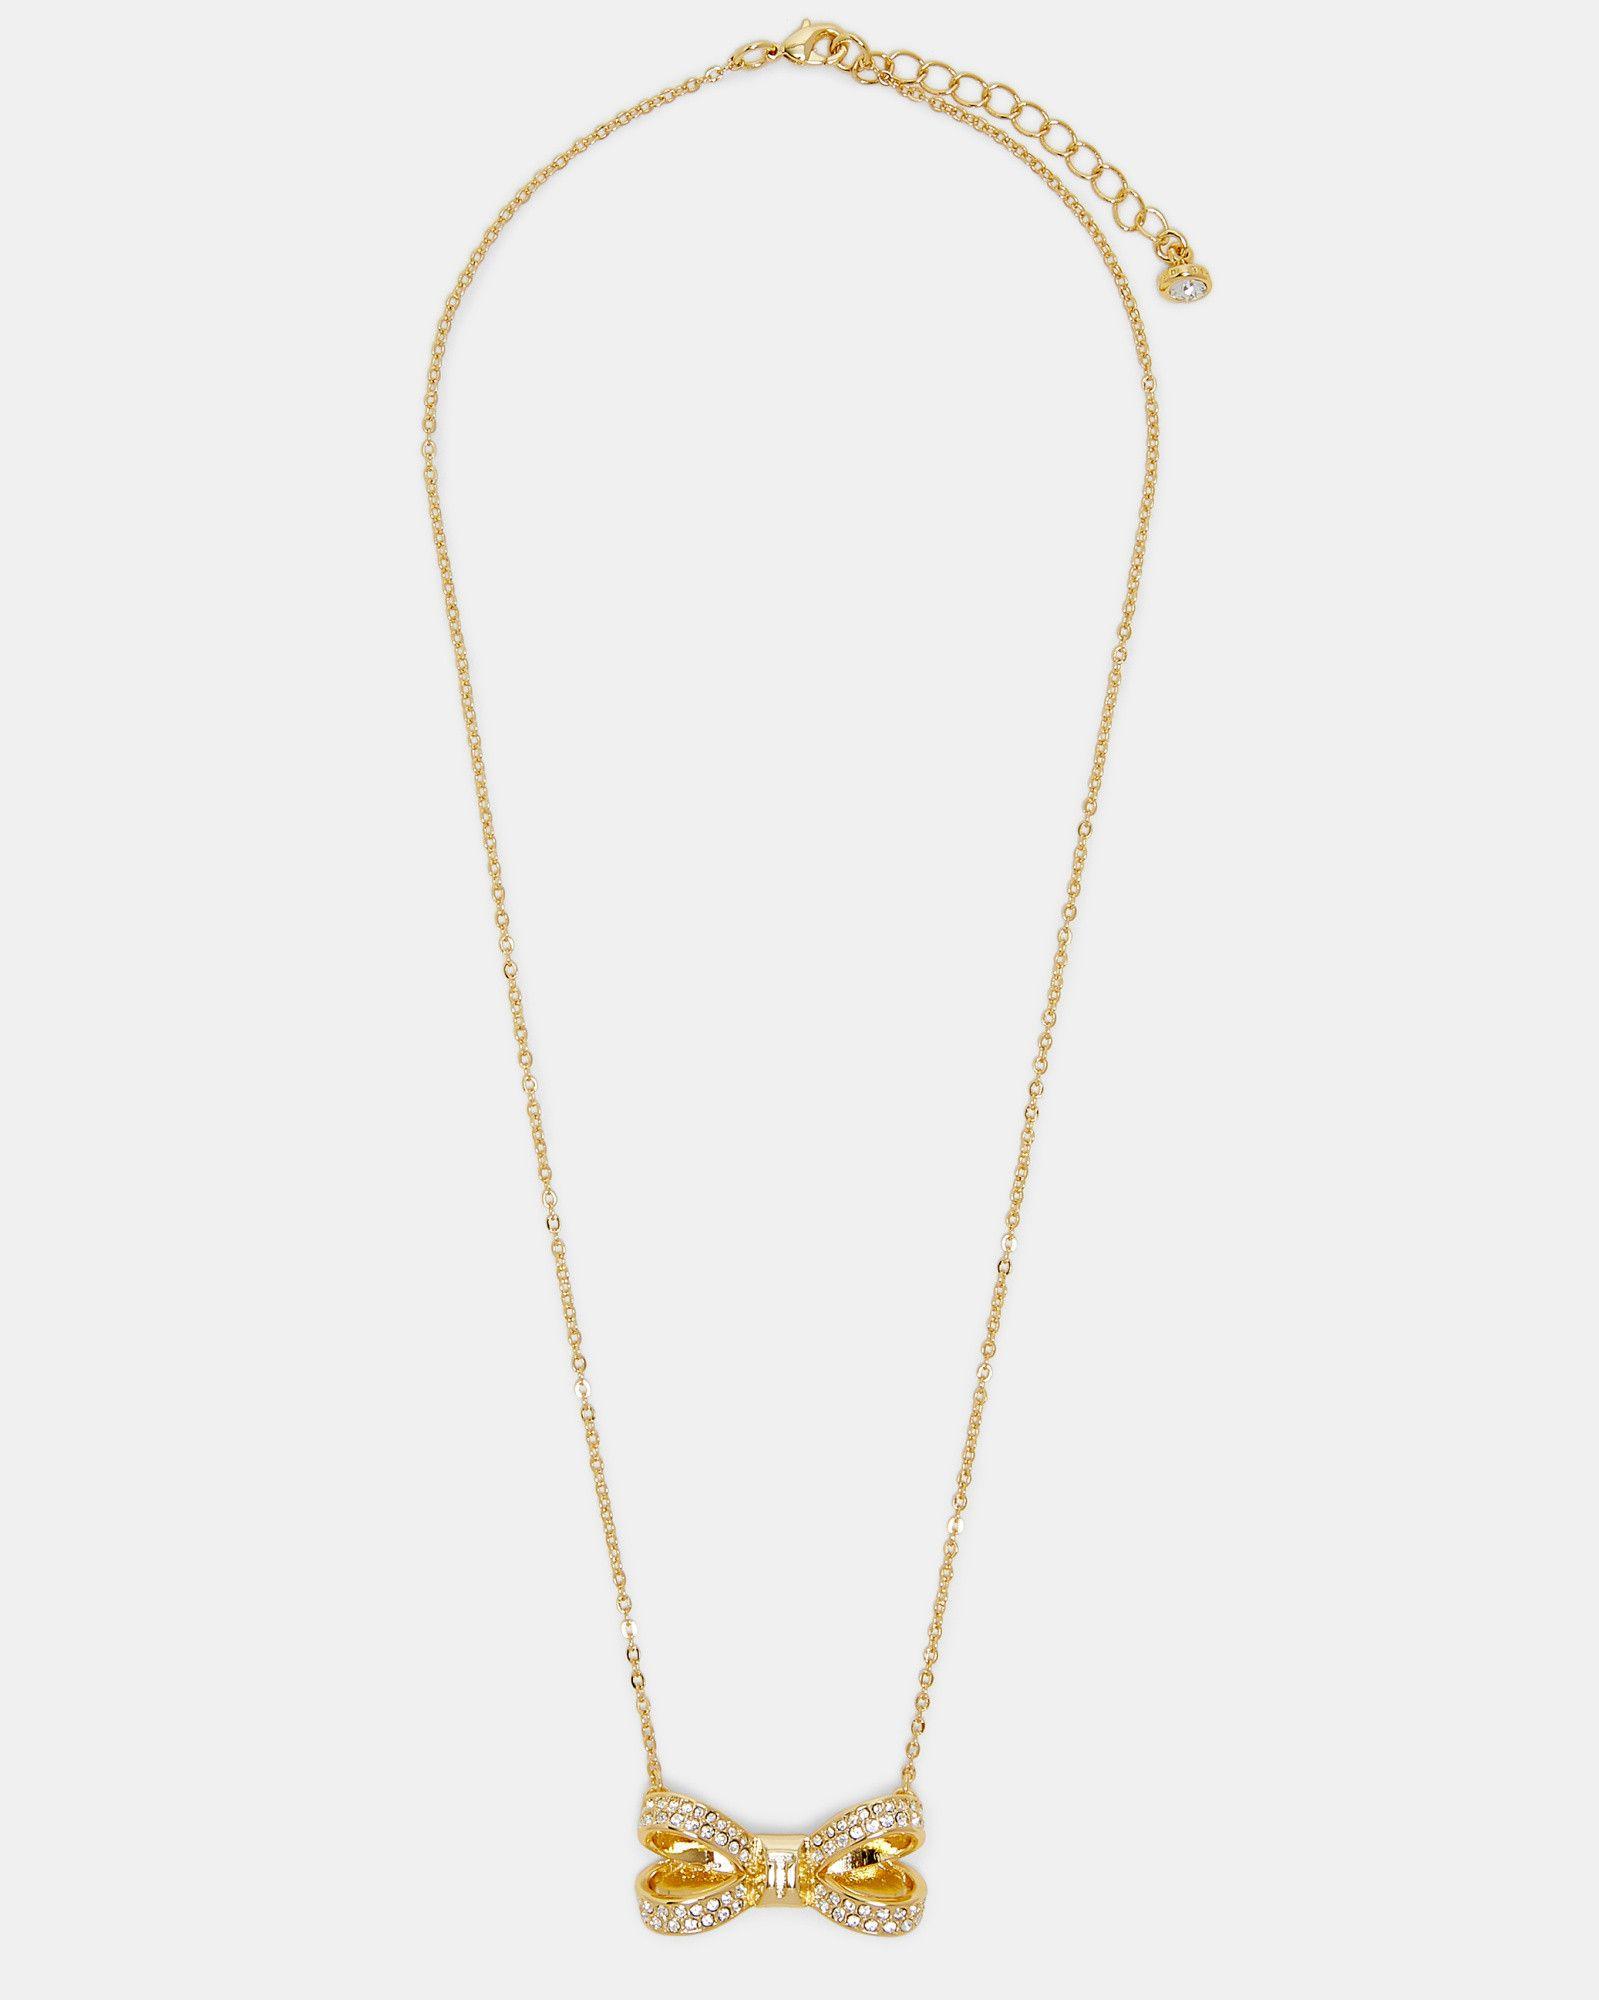 cec1e41da Ted Baker Swarovski® crystal bow necklace Gold | lady loves in 2019 ...